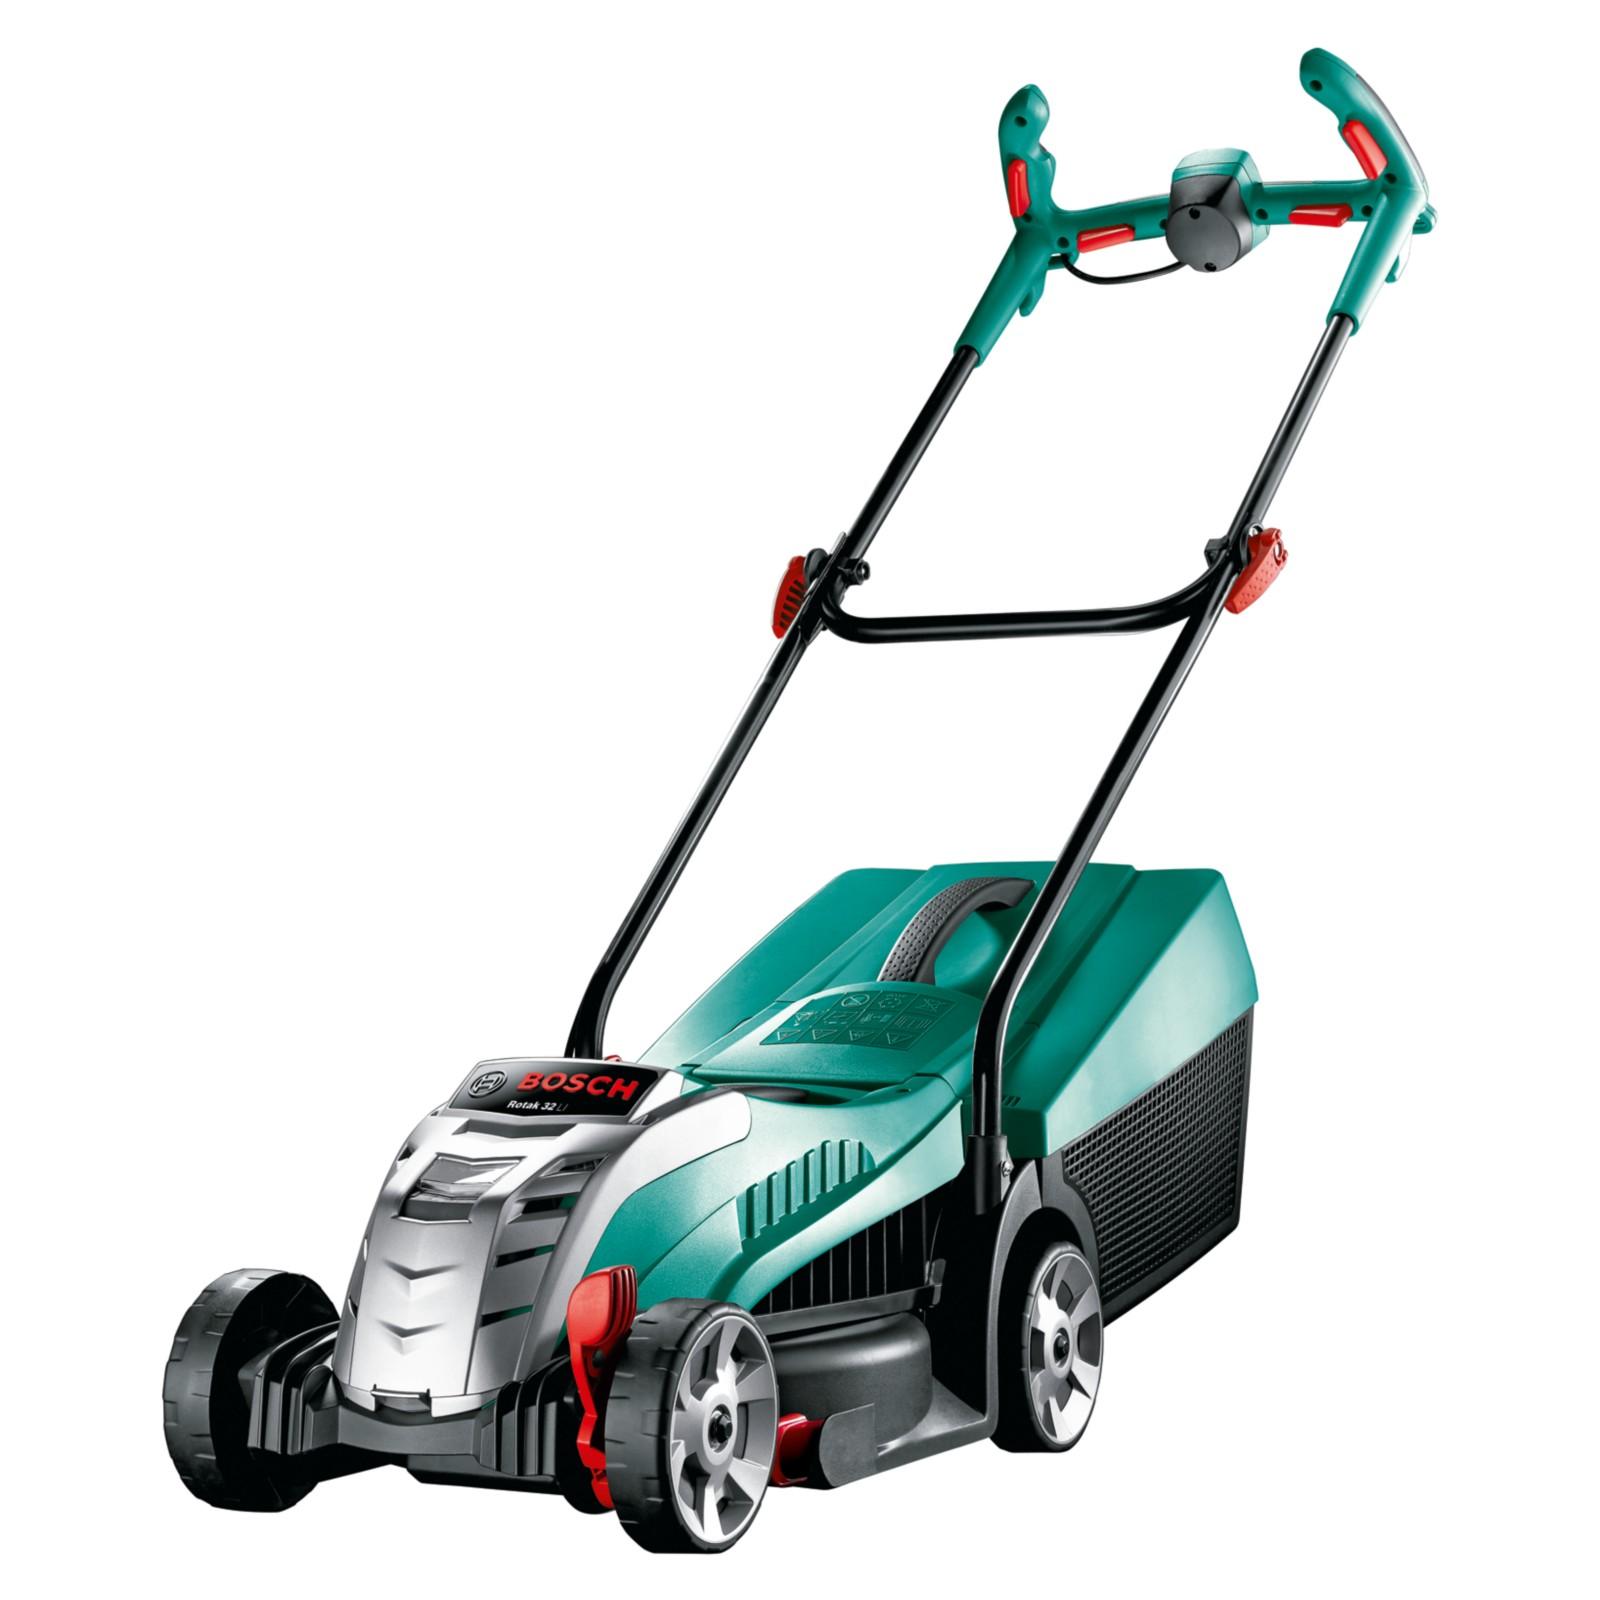 Bosch Rotak 32 LI High Power Cordless Lawnmower